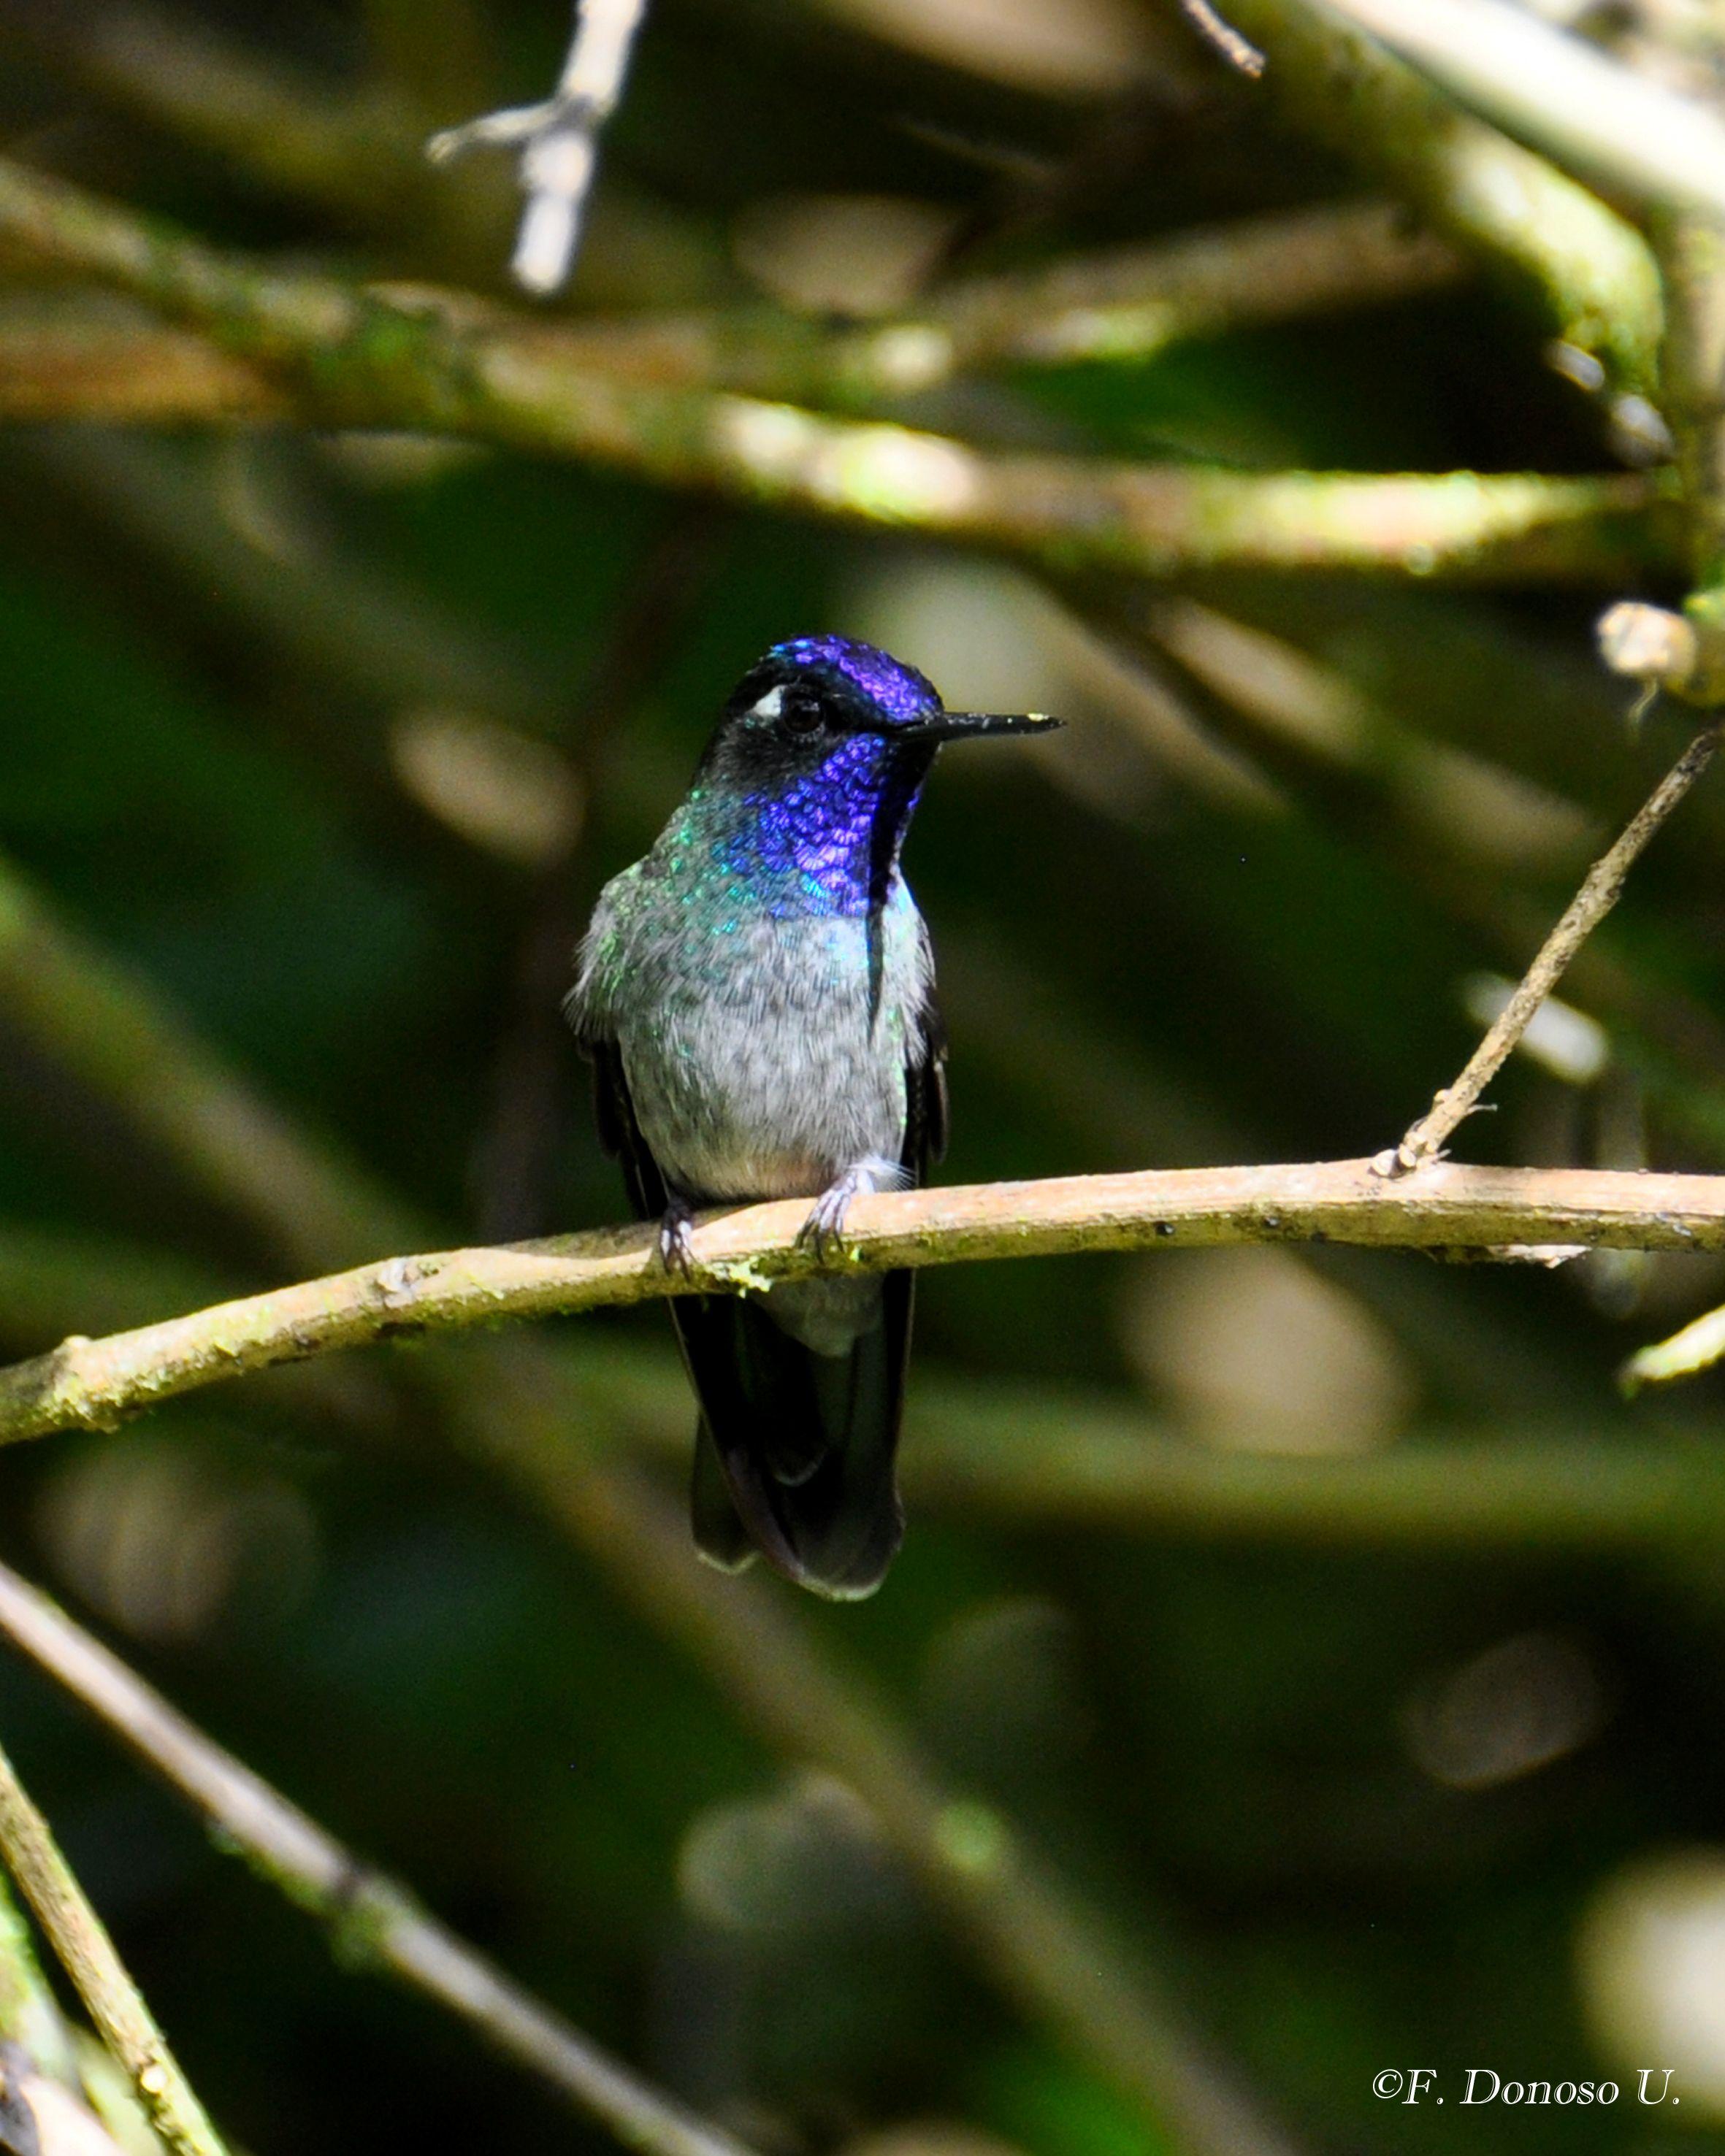 Violet-headed hummingbird. Wild Sumaco